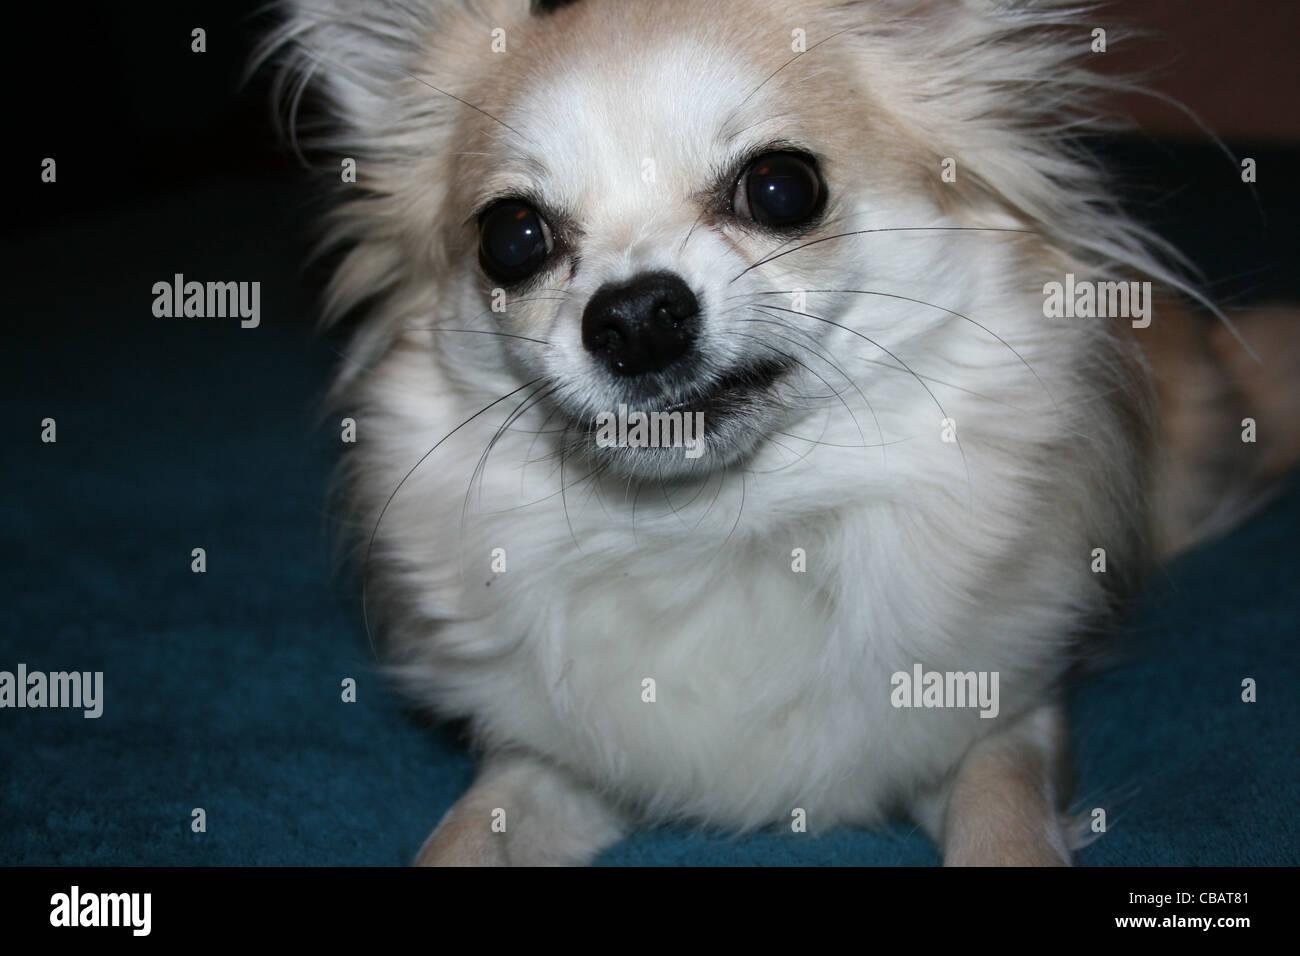 Long hair Chihuahua or Mexican Dog close up - Stock Image